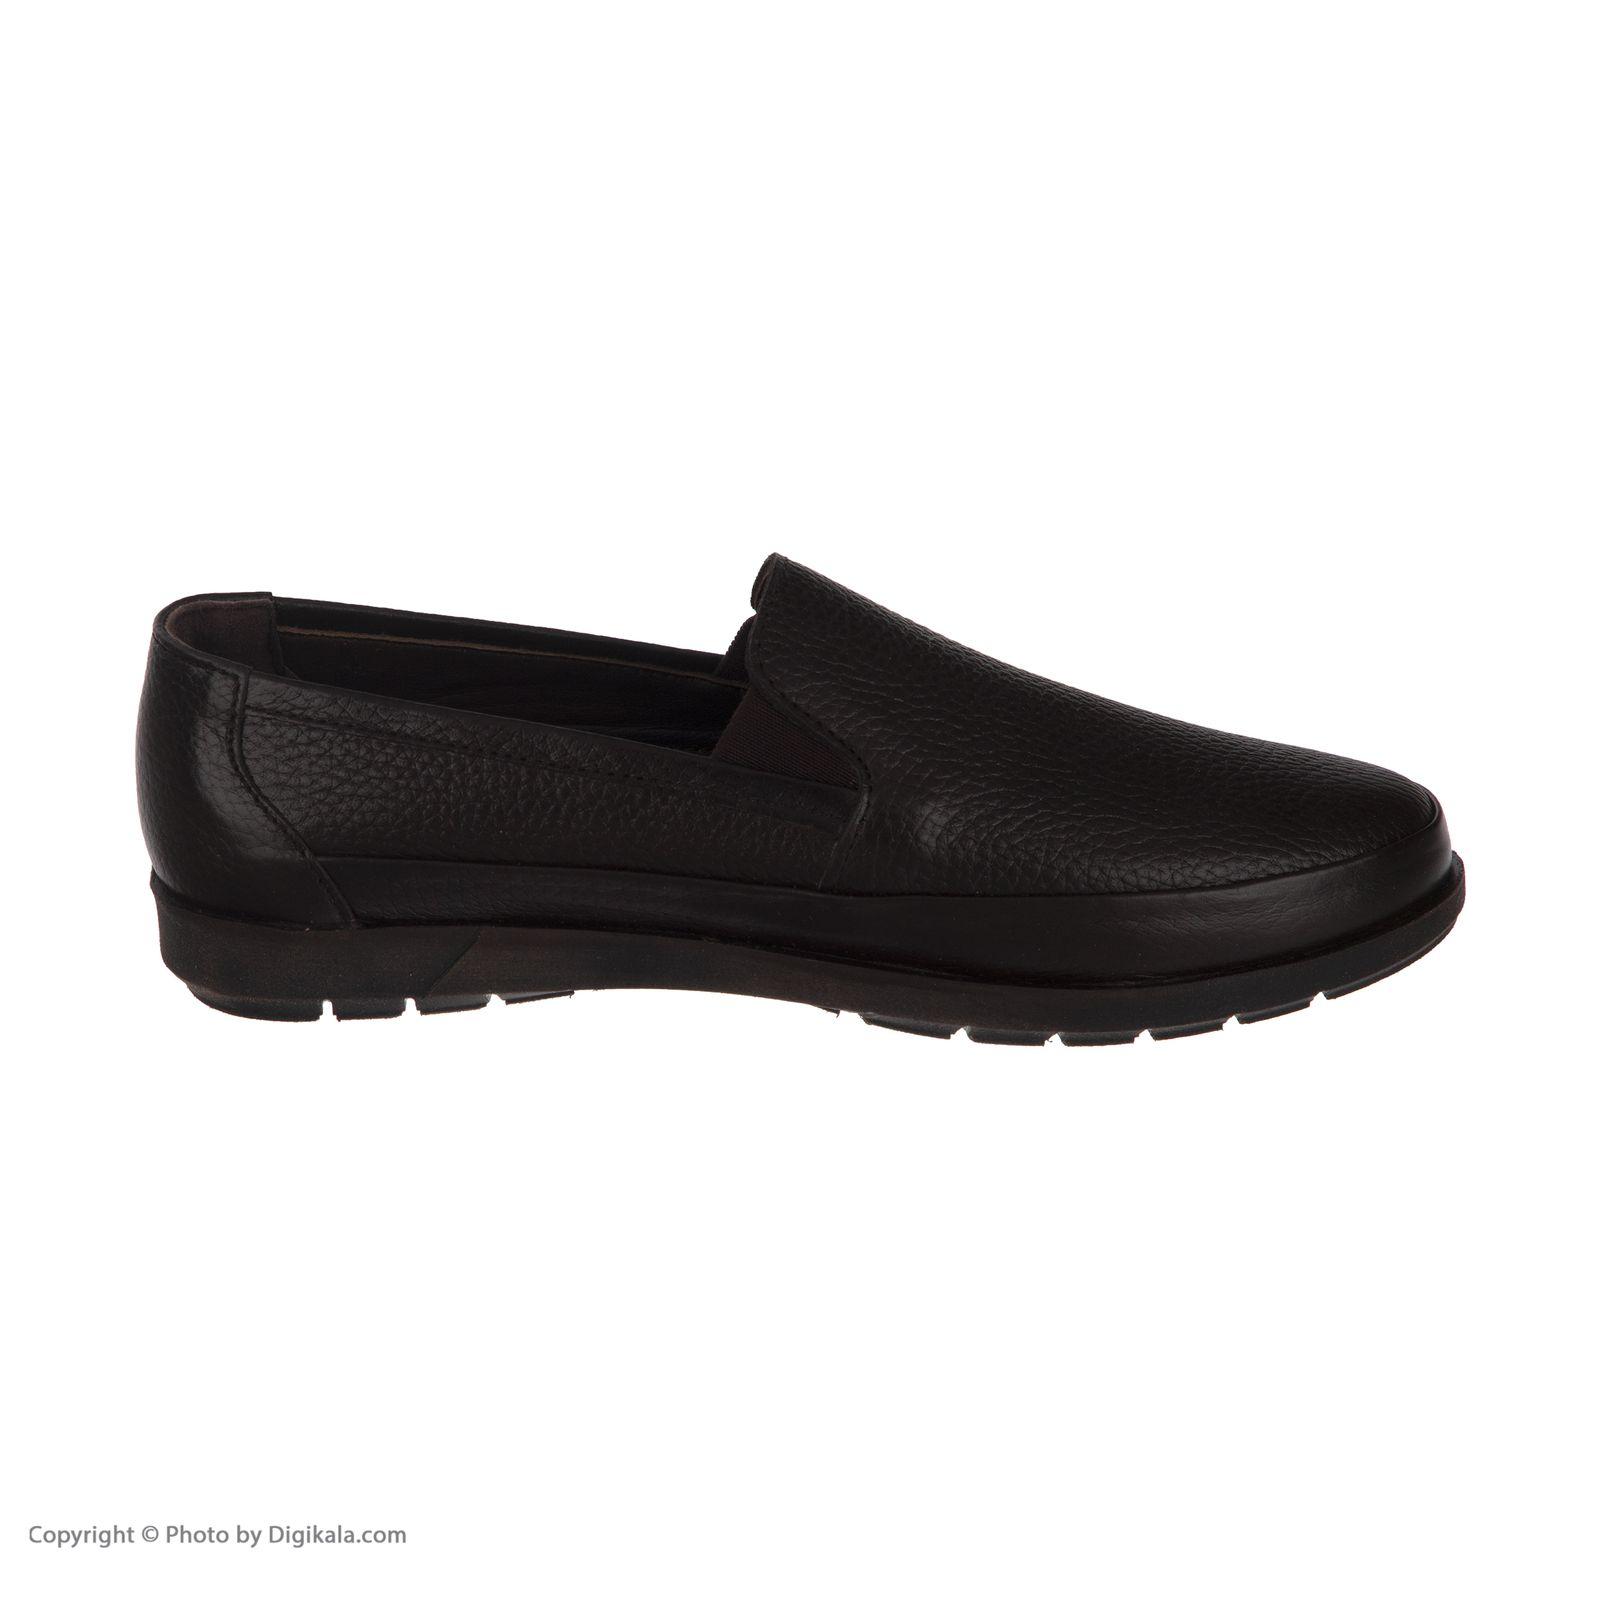 کفش روزمره زنانه سوته مدل 3069A500104 -  - 5